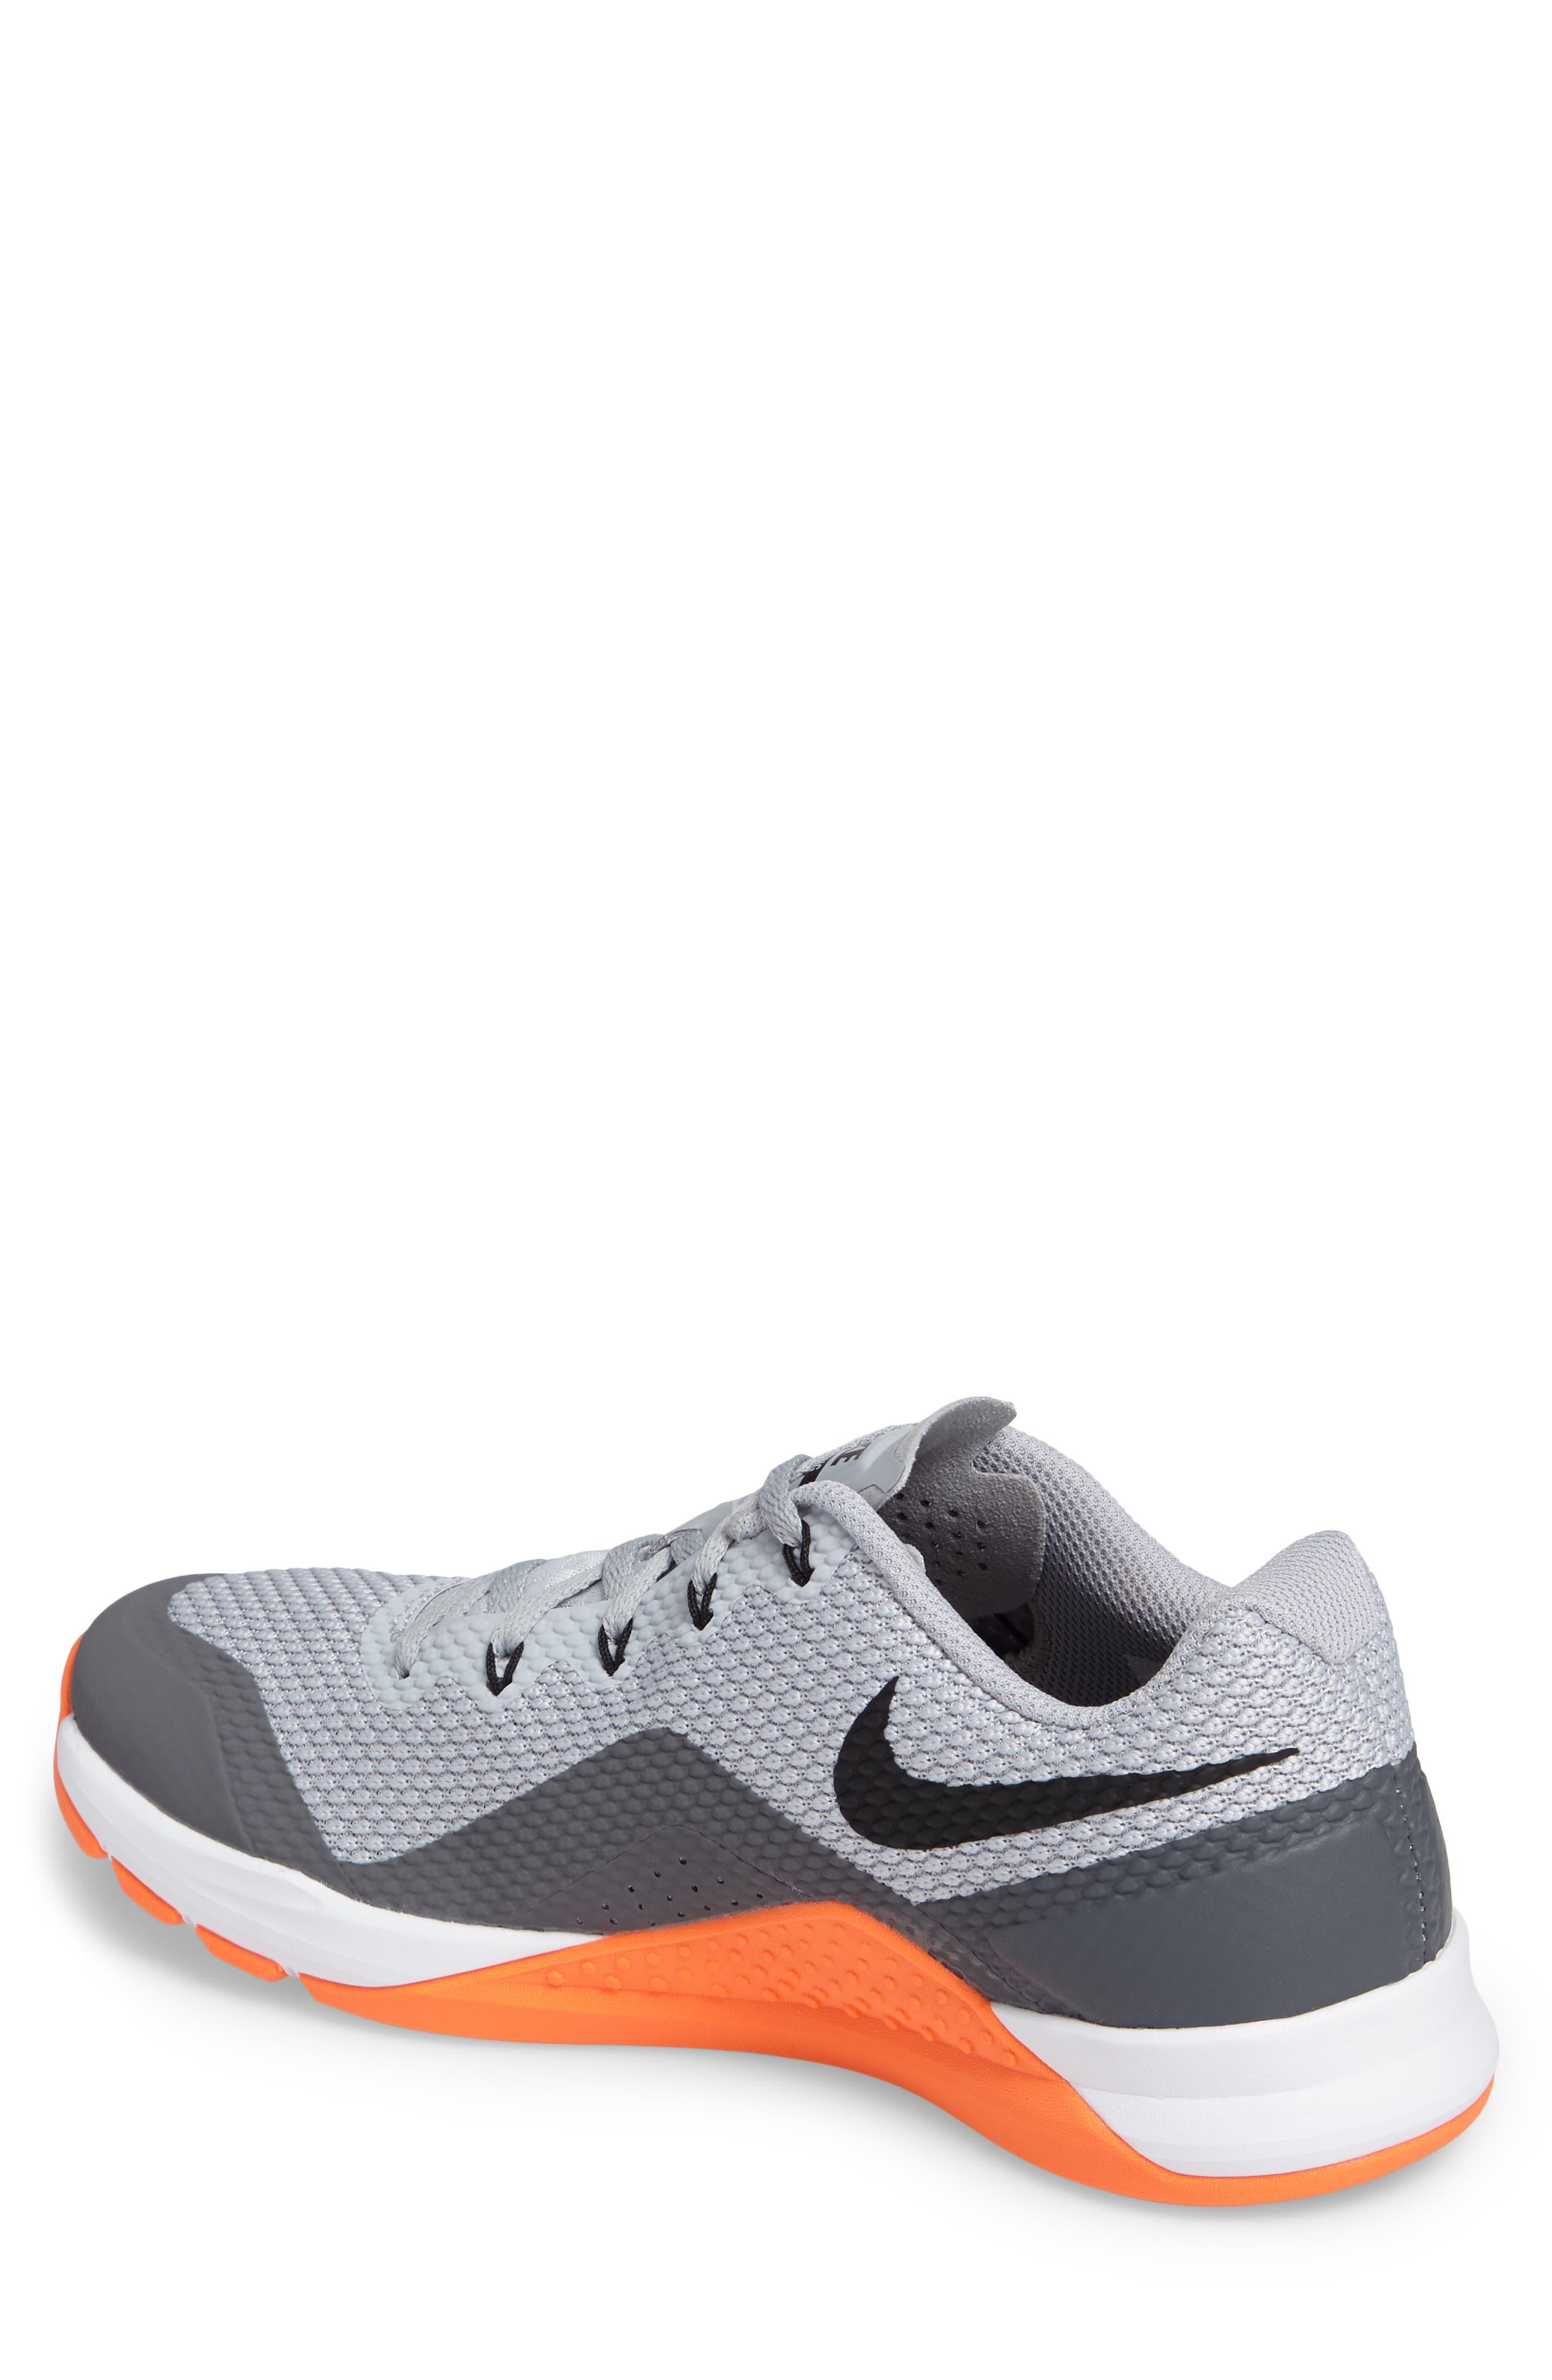 Metcon Repper DSX Training Shoe,                             Alternate thumbnail 2, color,                             026